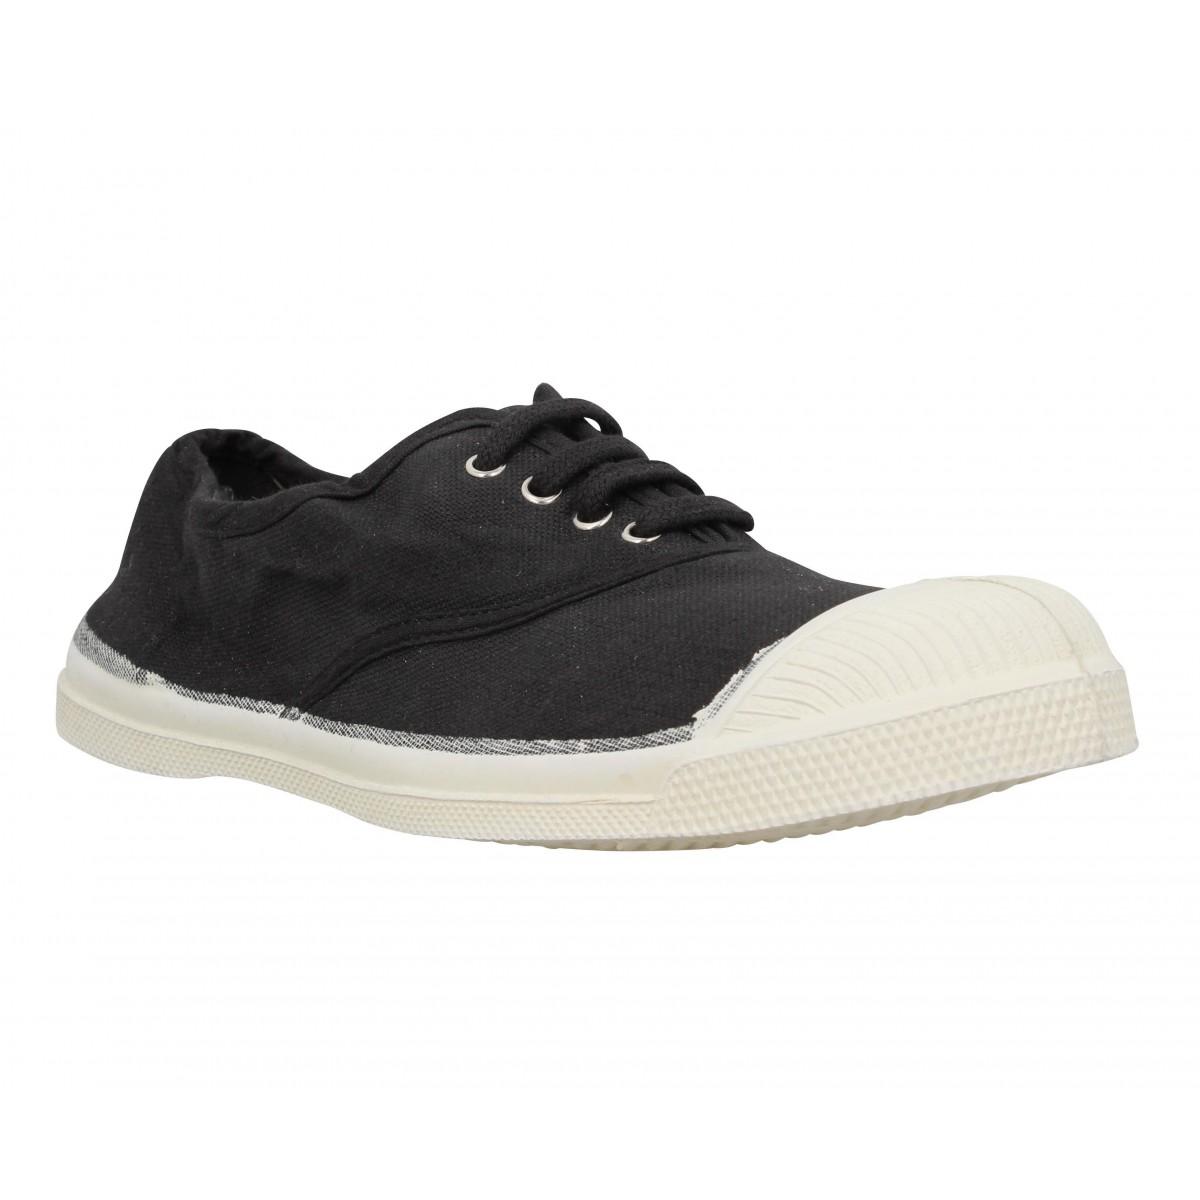 24236cf2682ffa Bensimon lacet toile femme carbone | Fanny chaussures